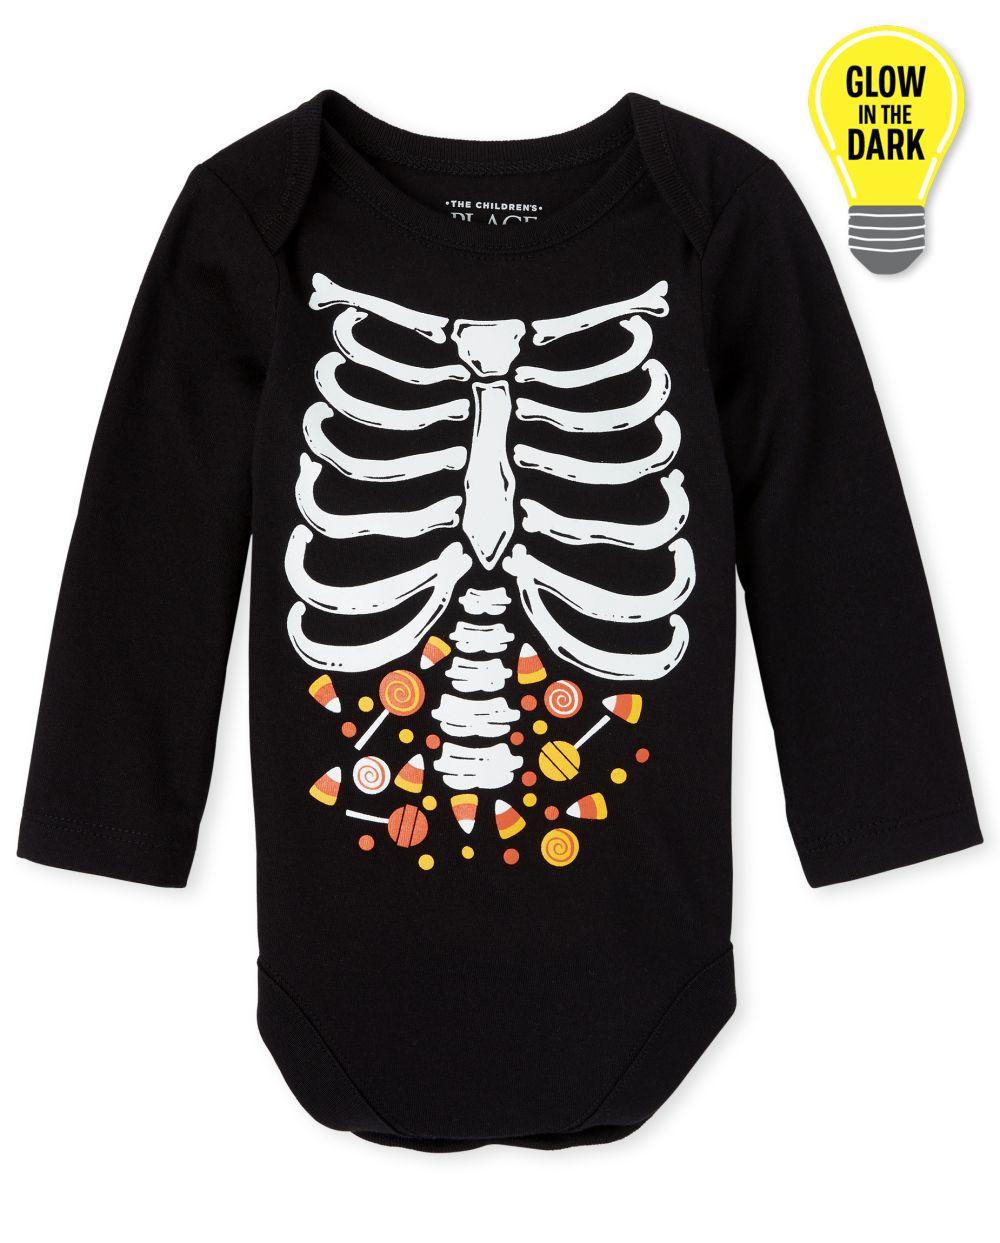 Body unisex con estampado de esqueleto de caramelo brillante de Halloween para bebé